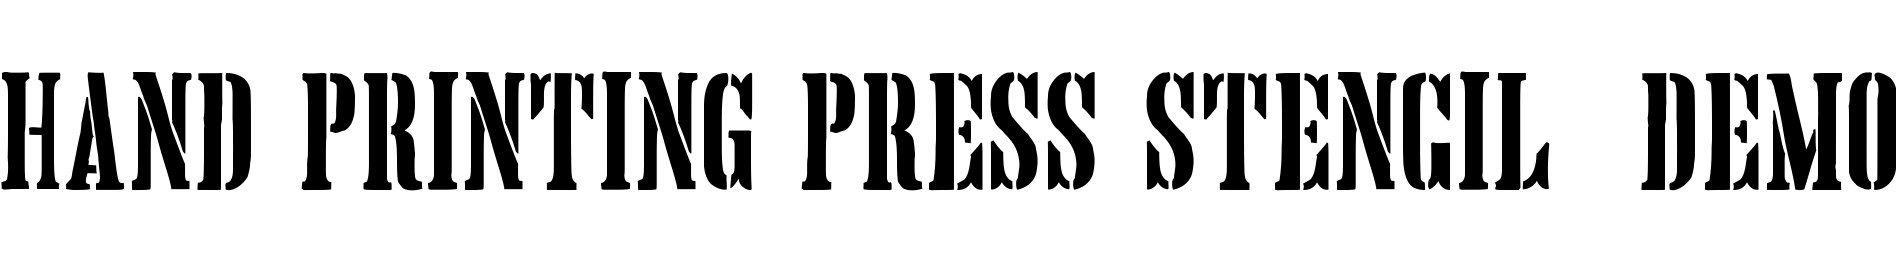 Hand Printing Press Stencil_demo